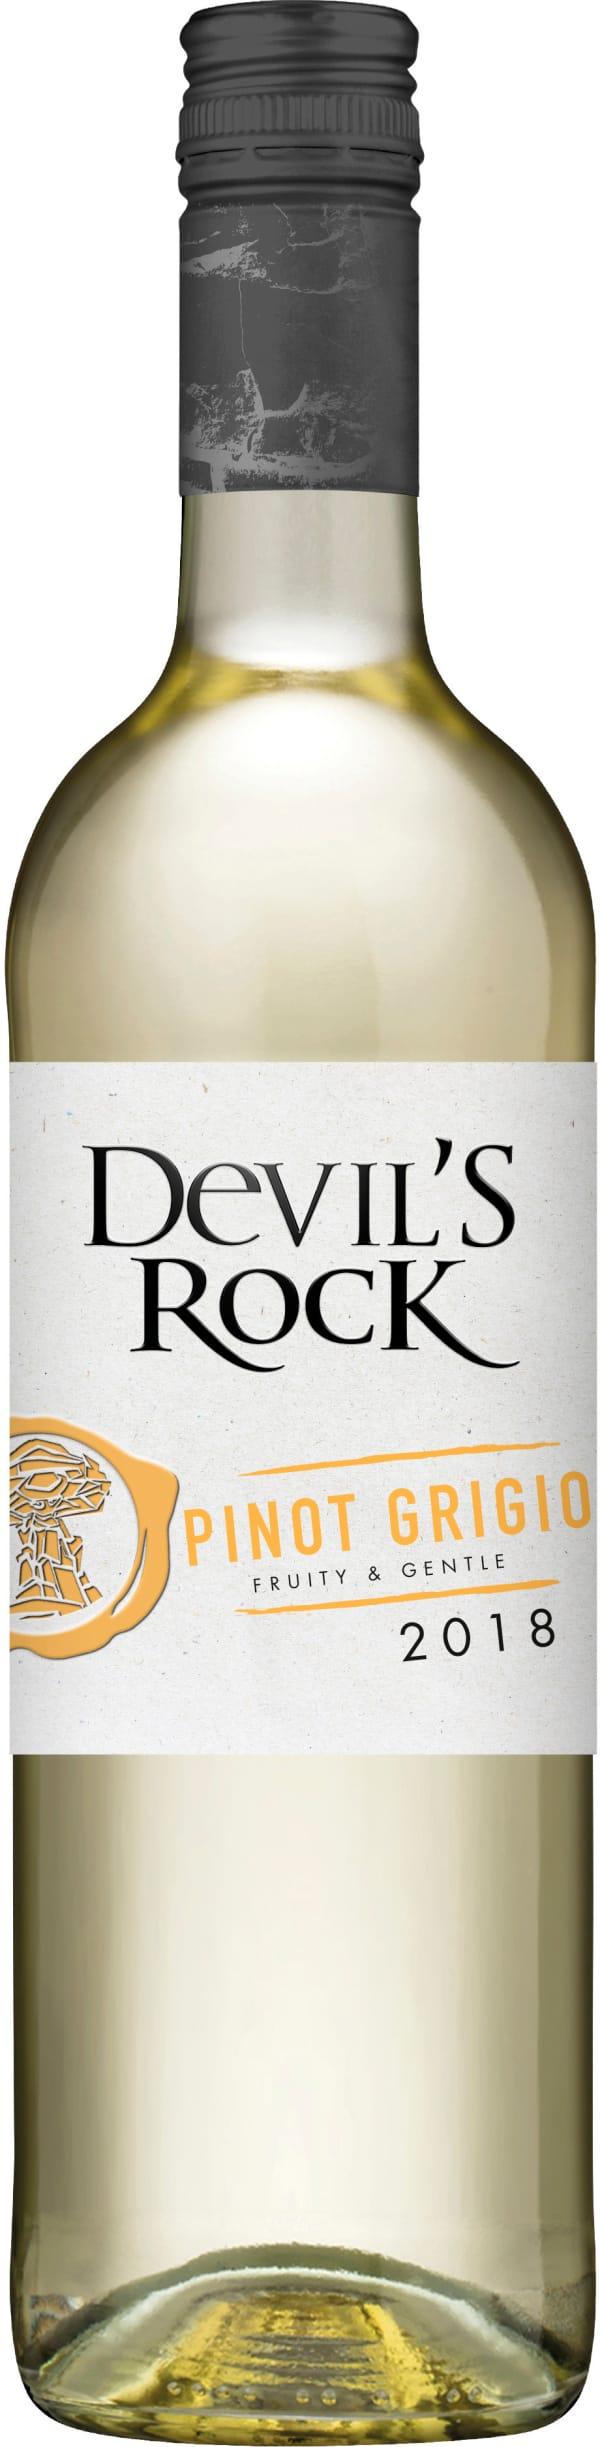 Devil's Rock Pinot Grigio 2017